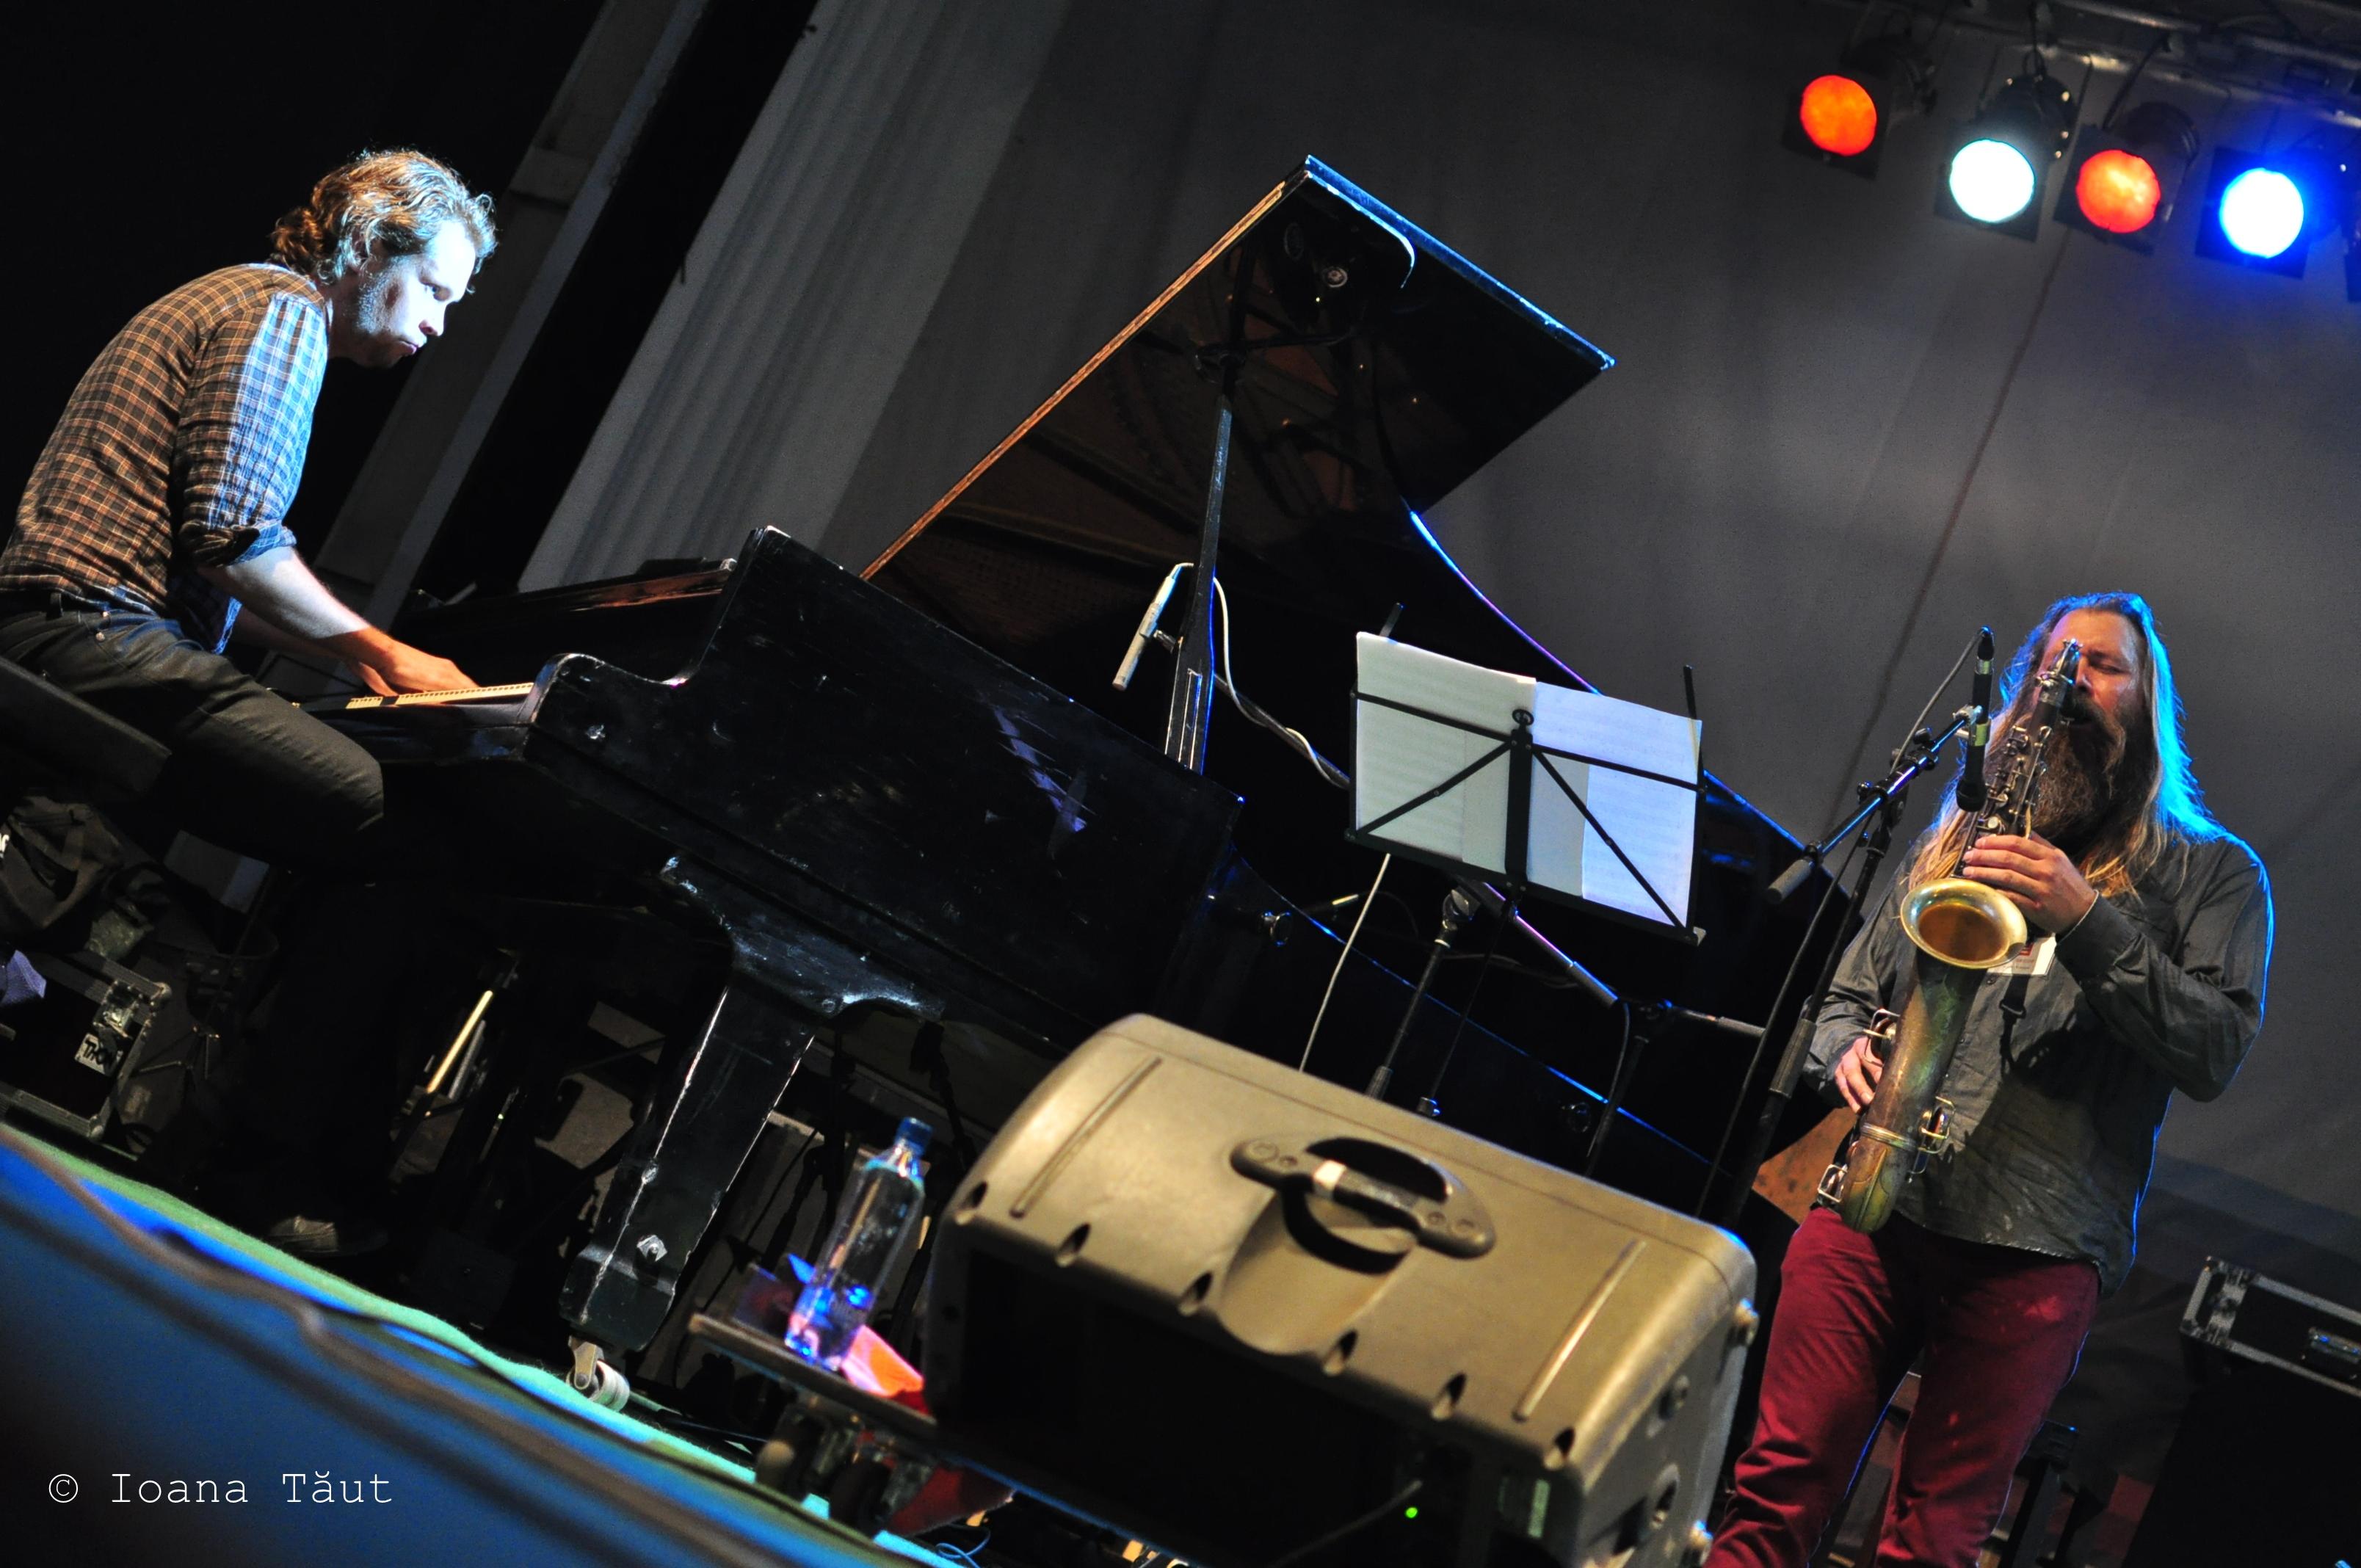 Kuara Feat. Trygve Seim @ Garana Jazz Festival 2012, Romania